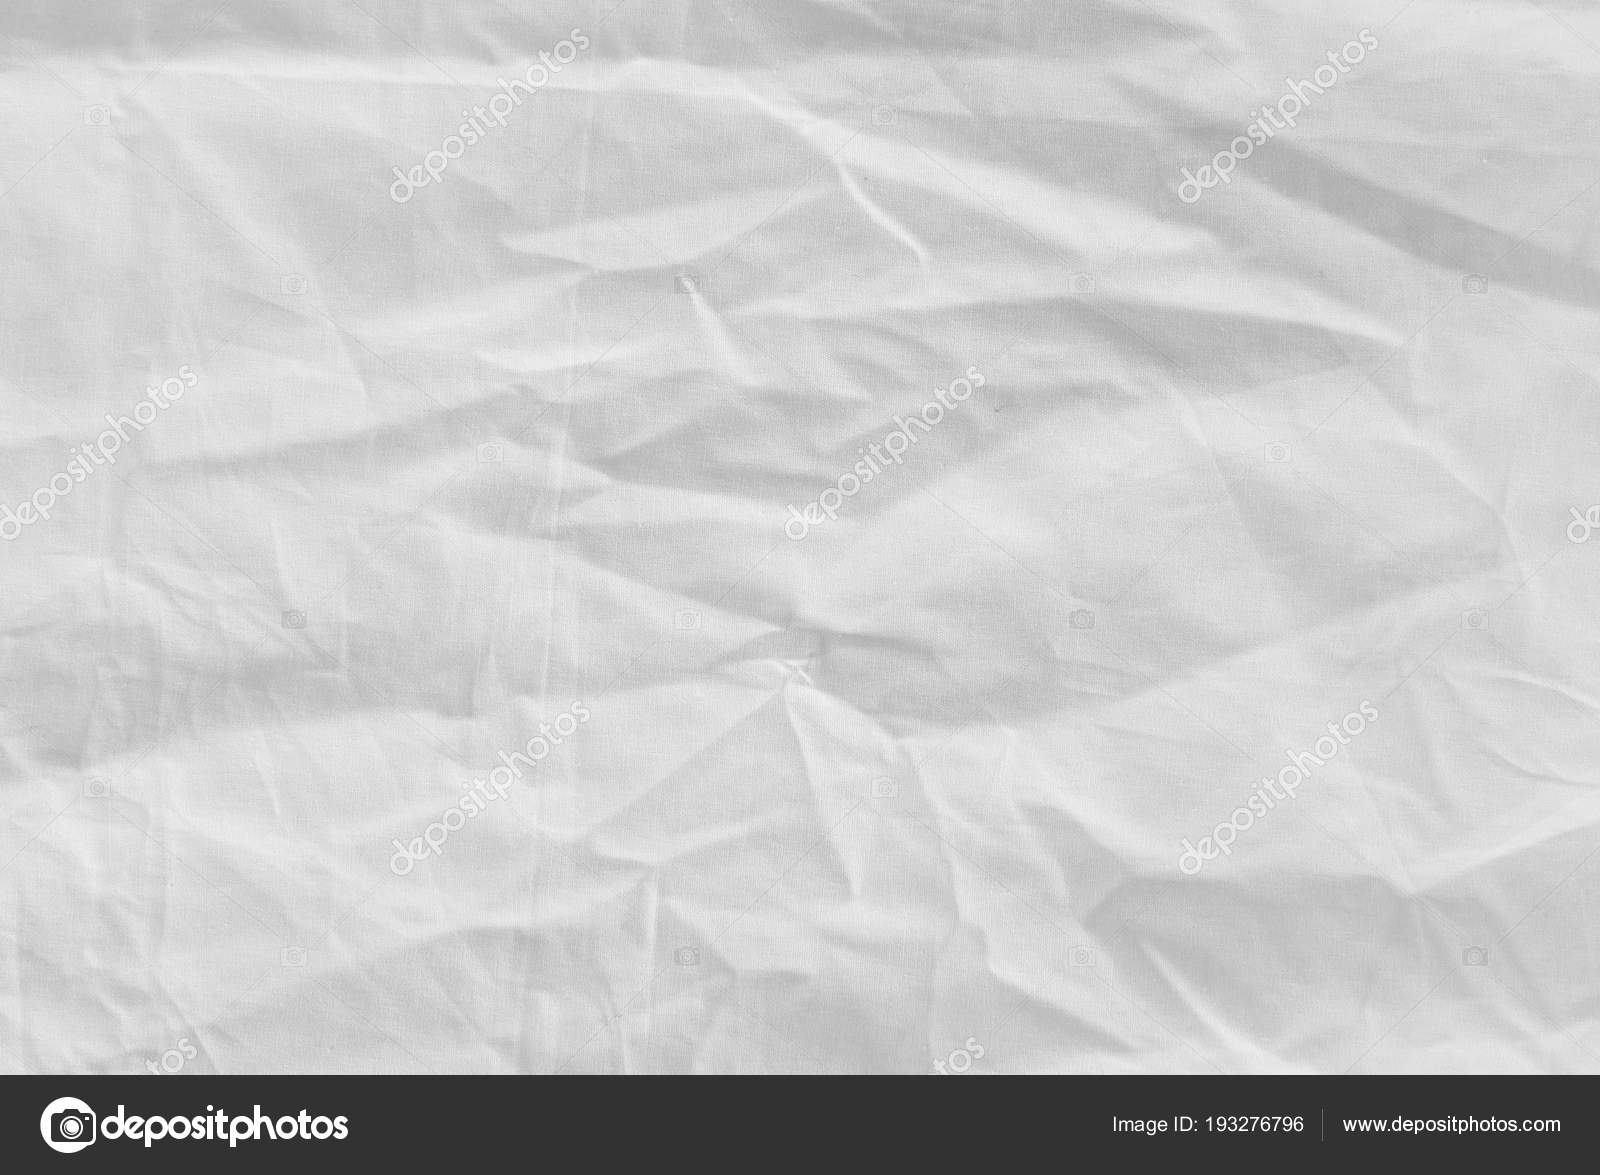 892d2a7a8ea5 Texture Astratta Tessuto Stropicciato — Foto Stock © kues #193276796